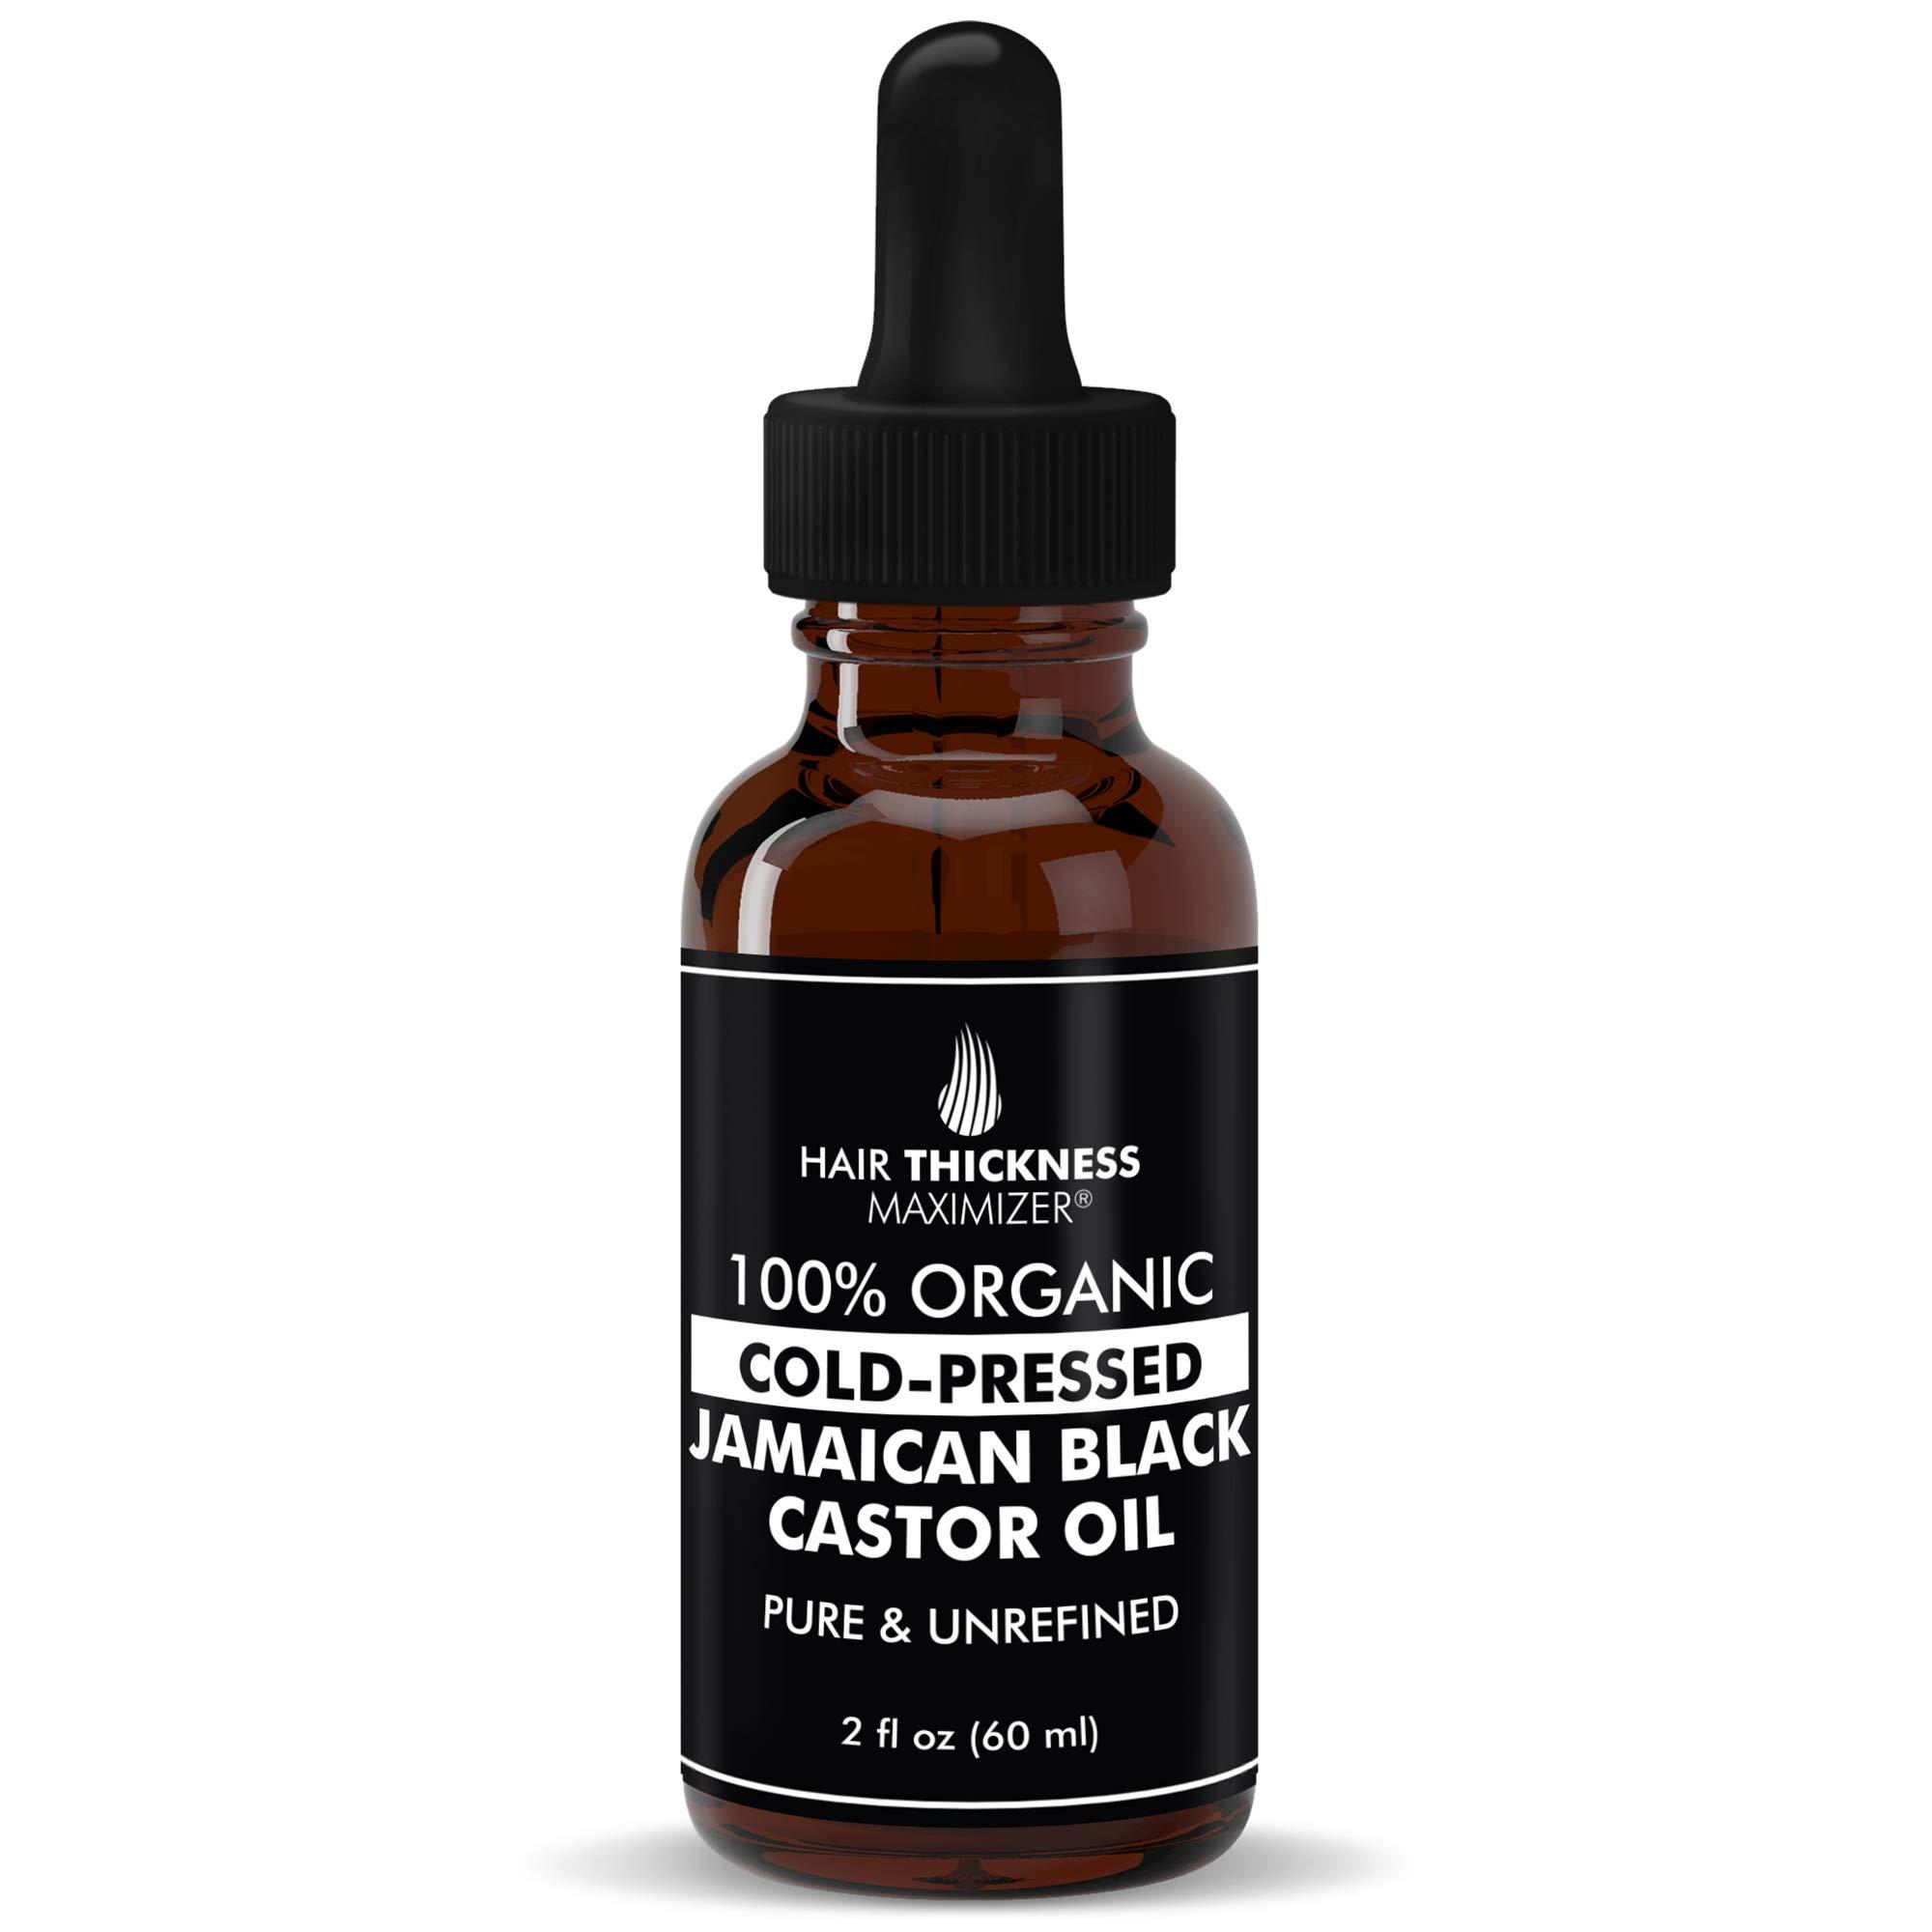 Amazon.com: Liquid Vegan BIOTIN Drops 5000 MCG by Hair